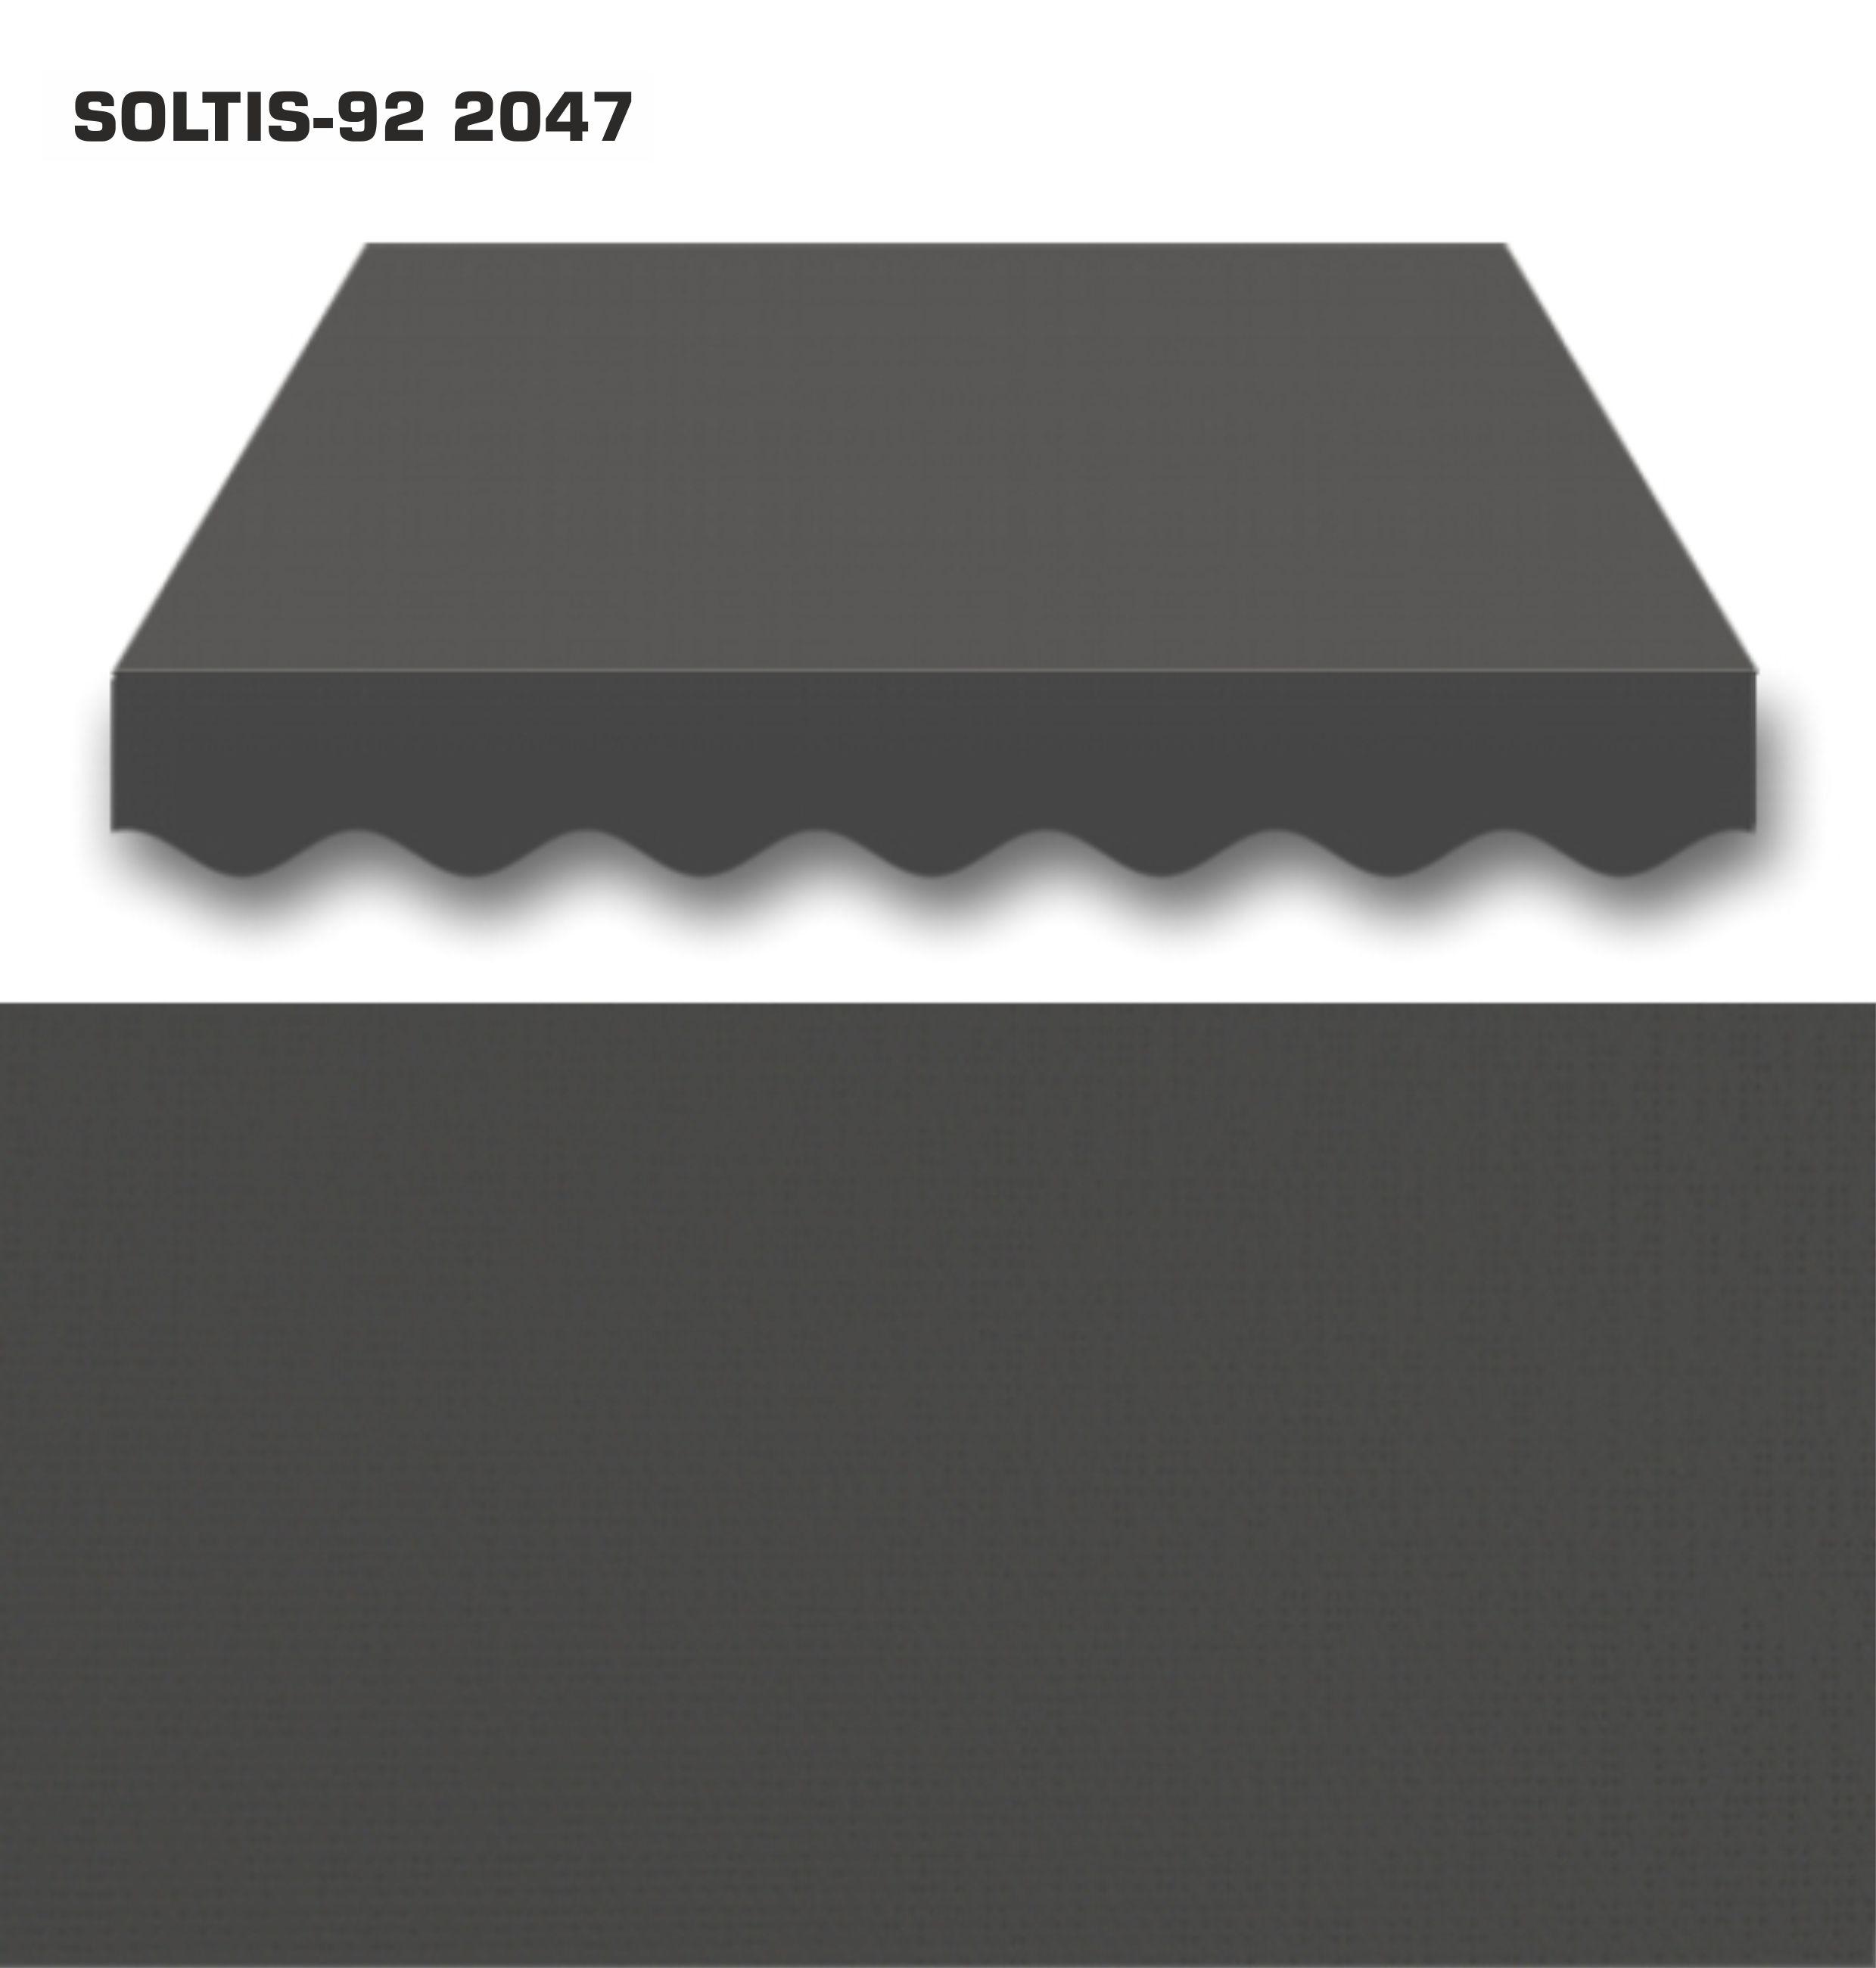 Soltis-92 2047